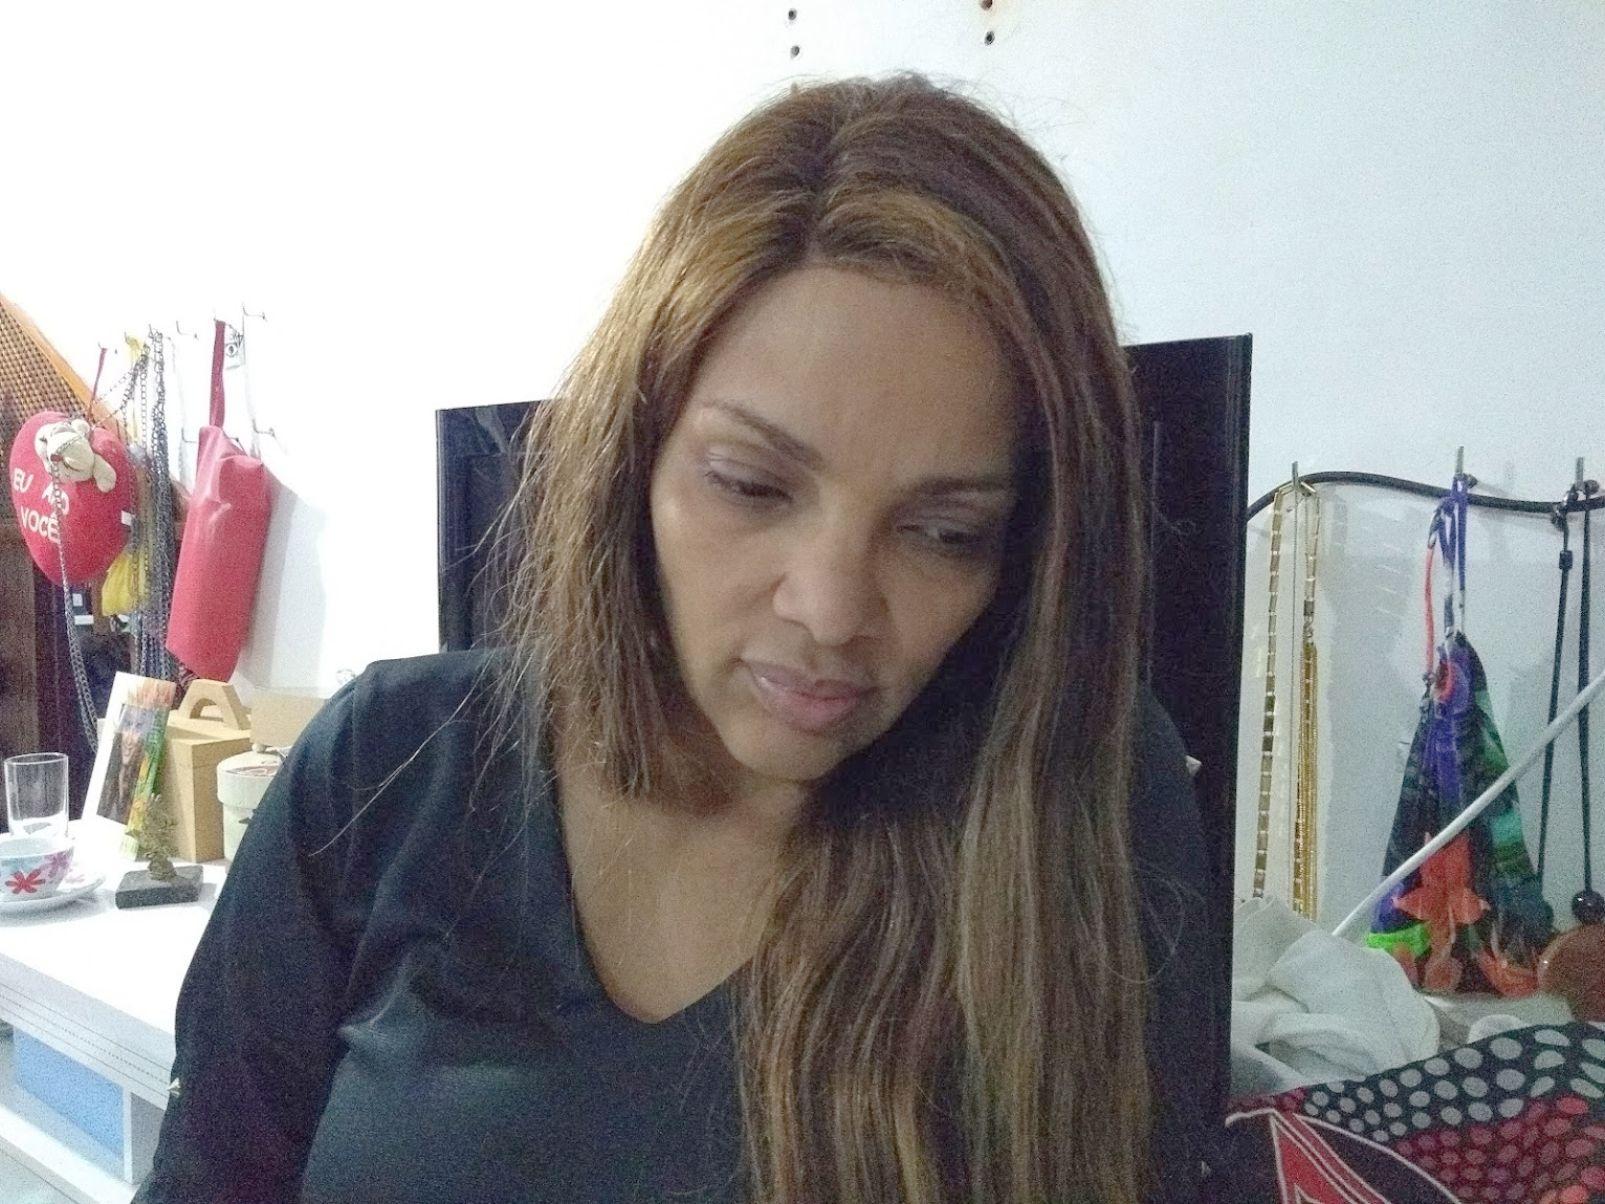 ELAINE JESUS CD DO MILAGRE DONO BAIXAR DE